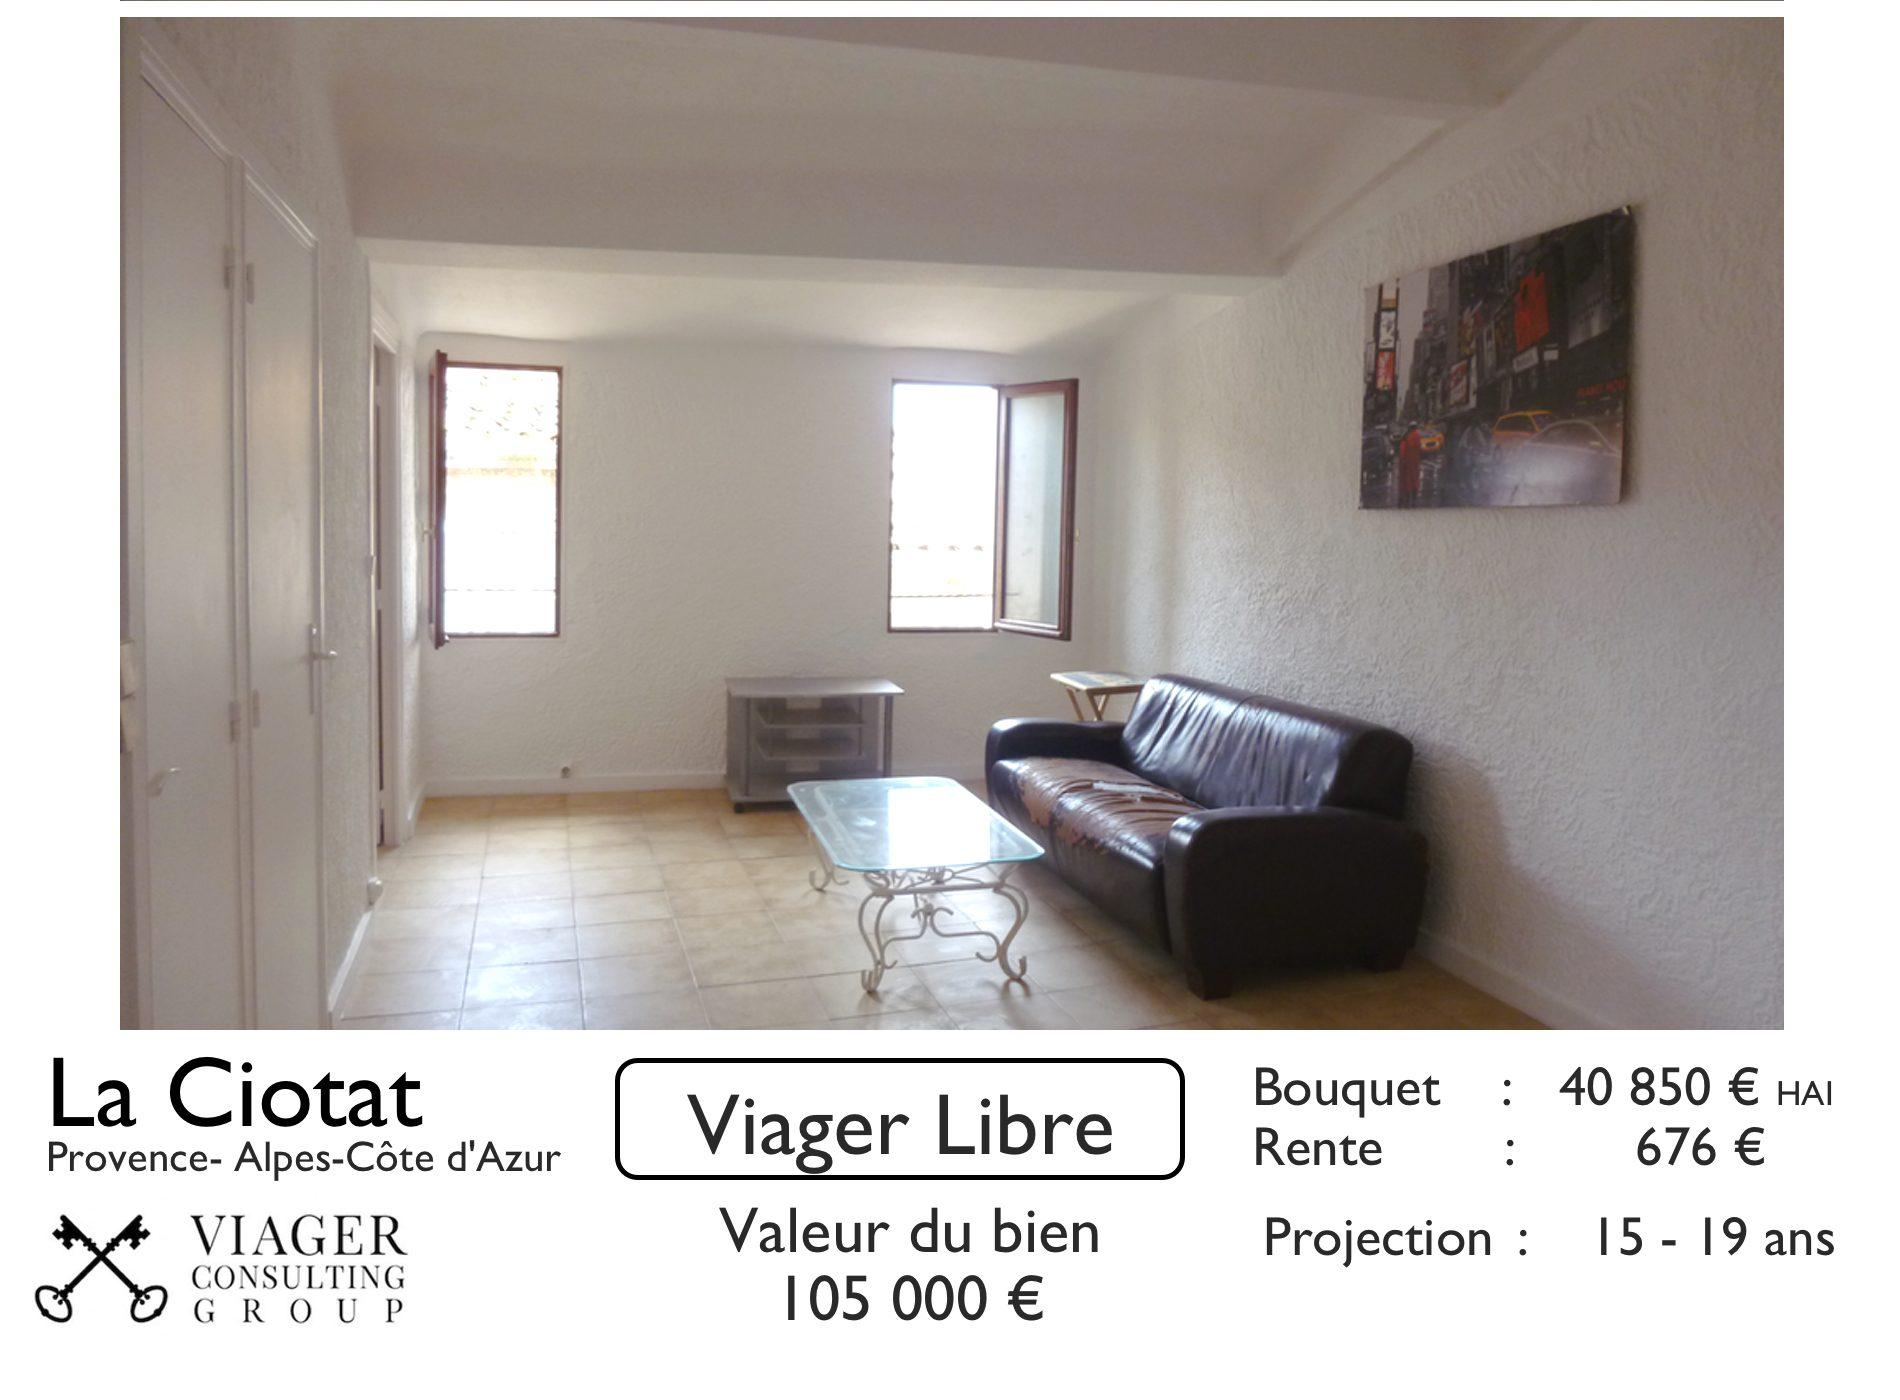 appartement vendre en viager libre la ciotat 13600 nuepro viager. Black Bedroom Furniture Sets. Home Design Ideas